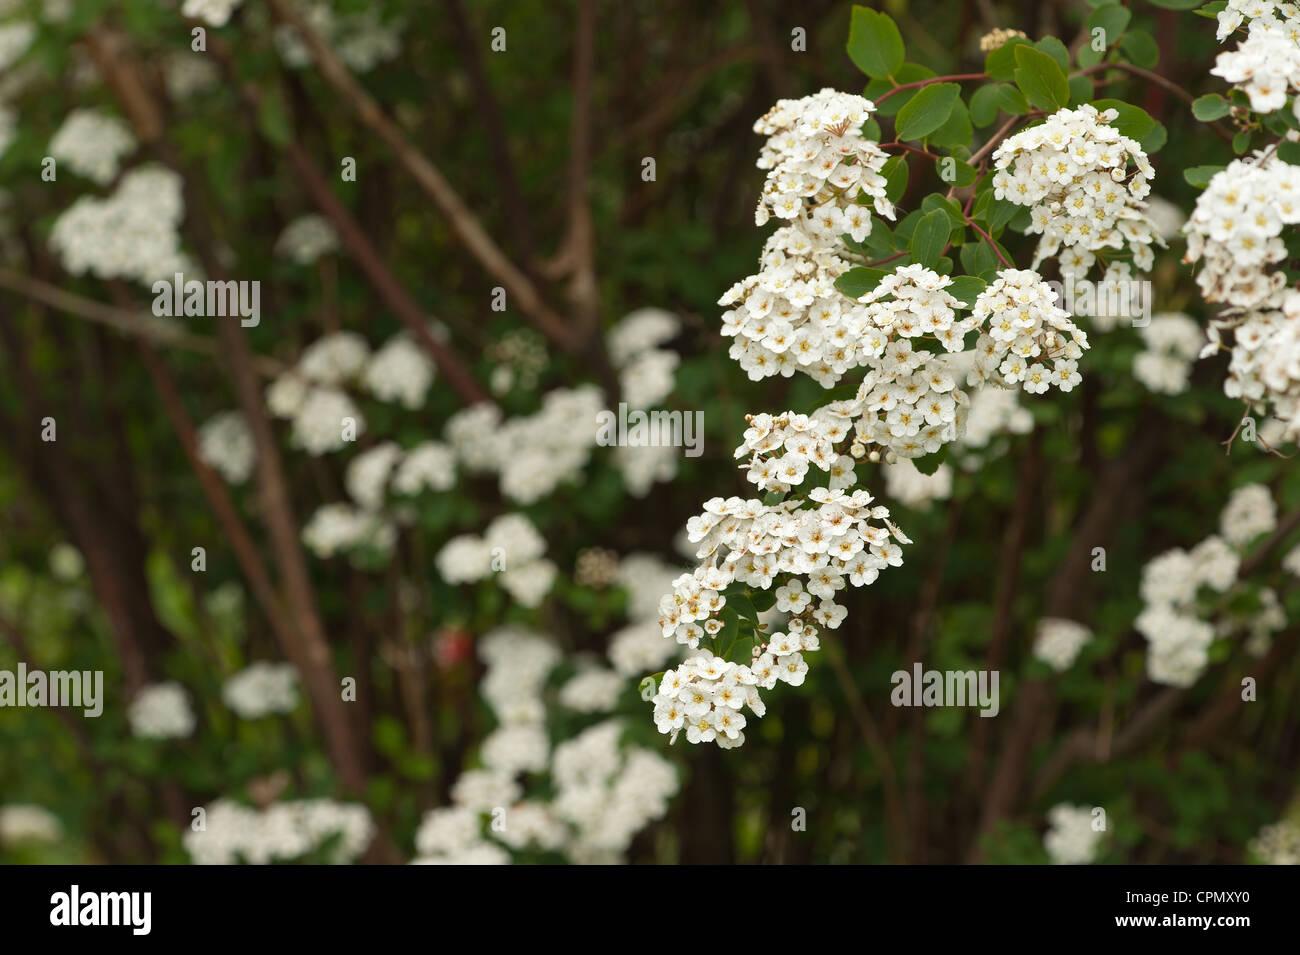 Salycylate photos salycylate images alamy - Arbuste a petites fleurs blanches ...